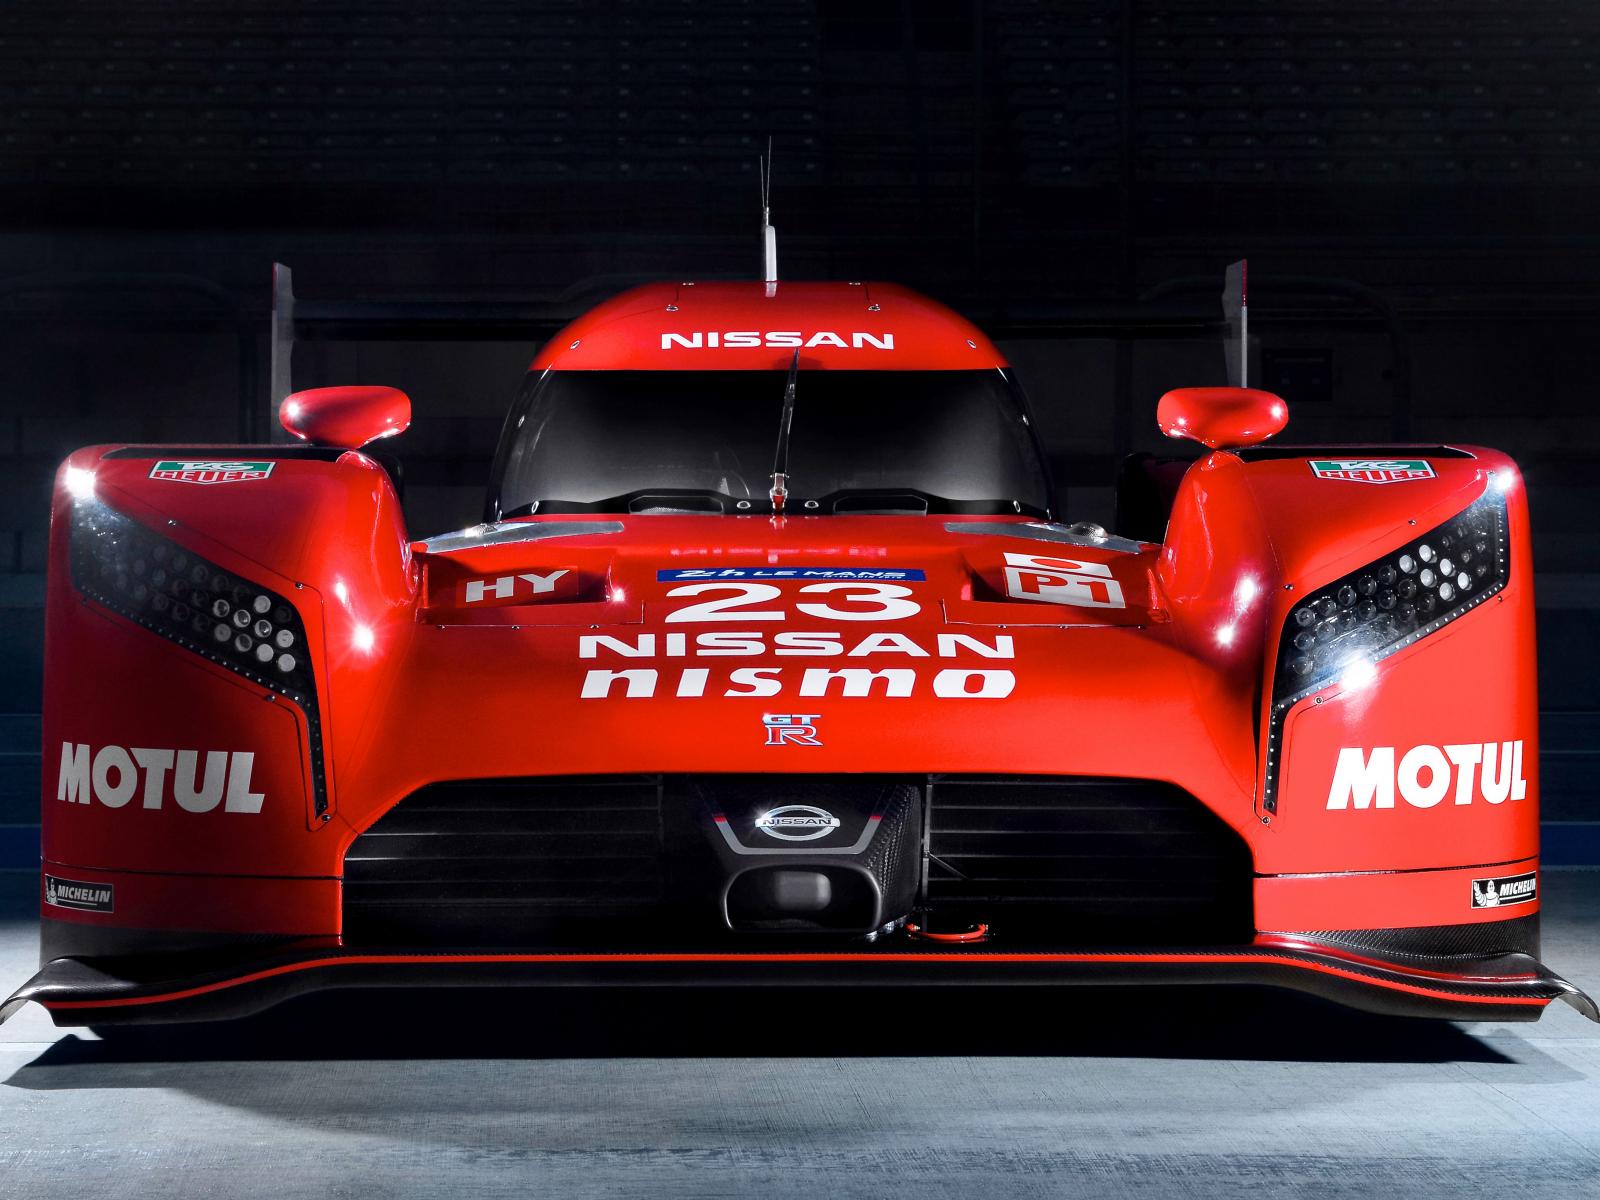 1600x1200 wallpaper Nissan GT-R LM Nismo prototype racing car